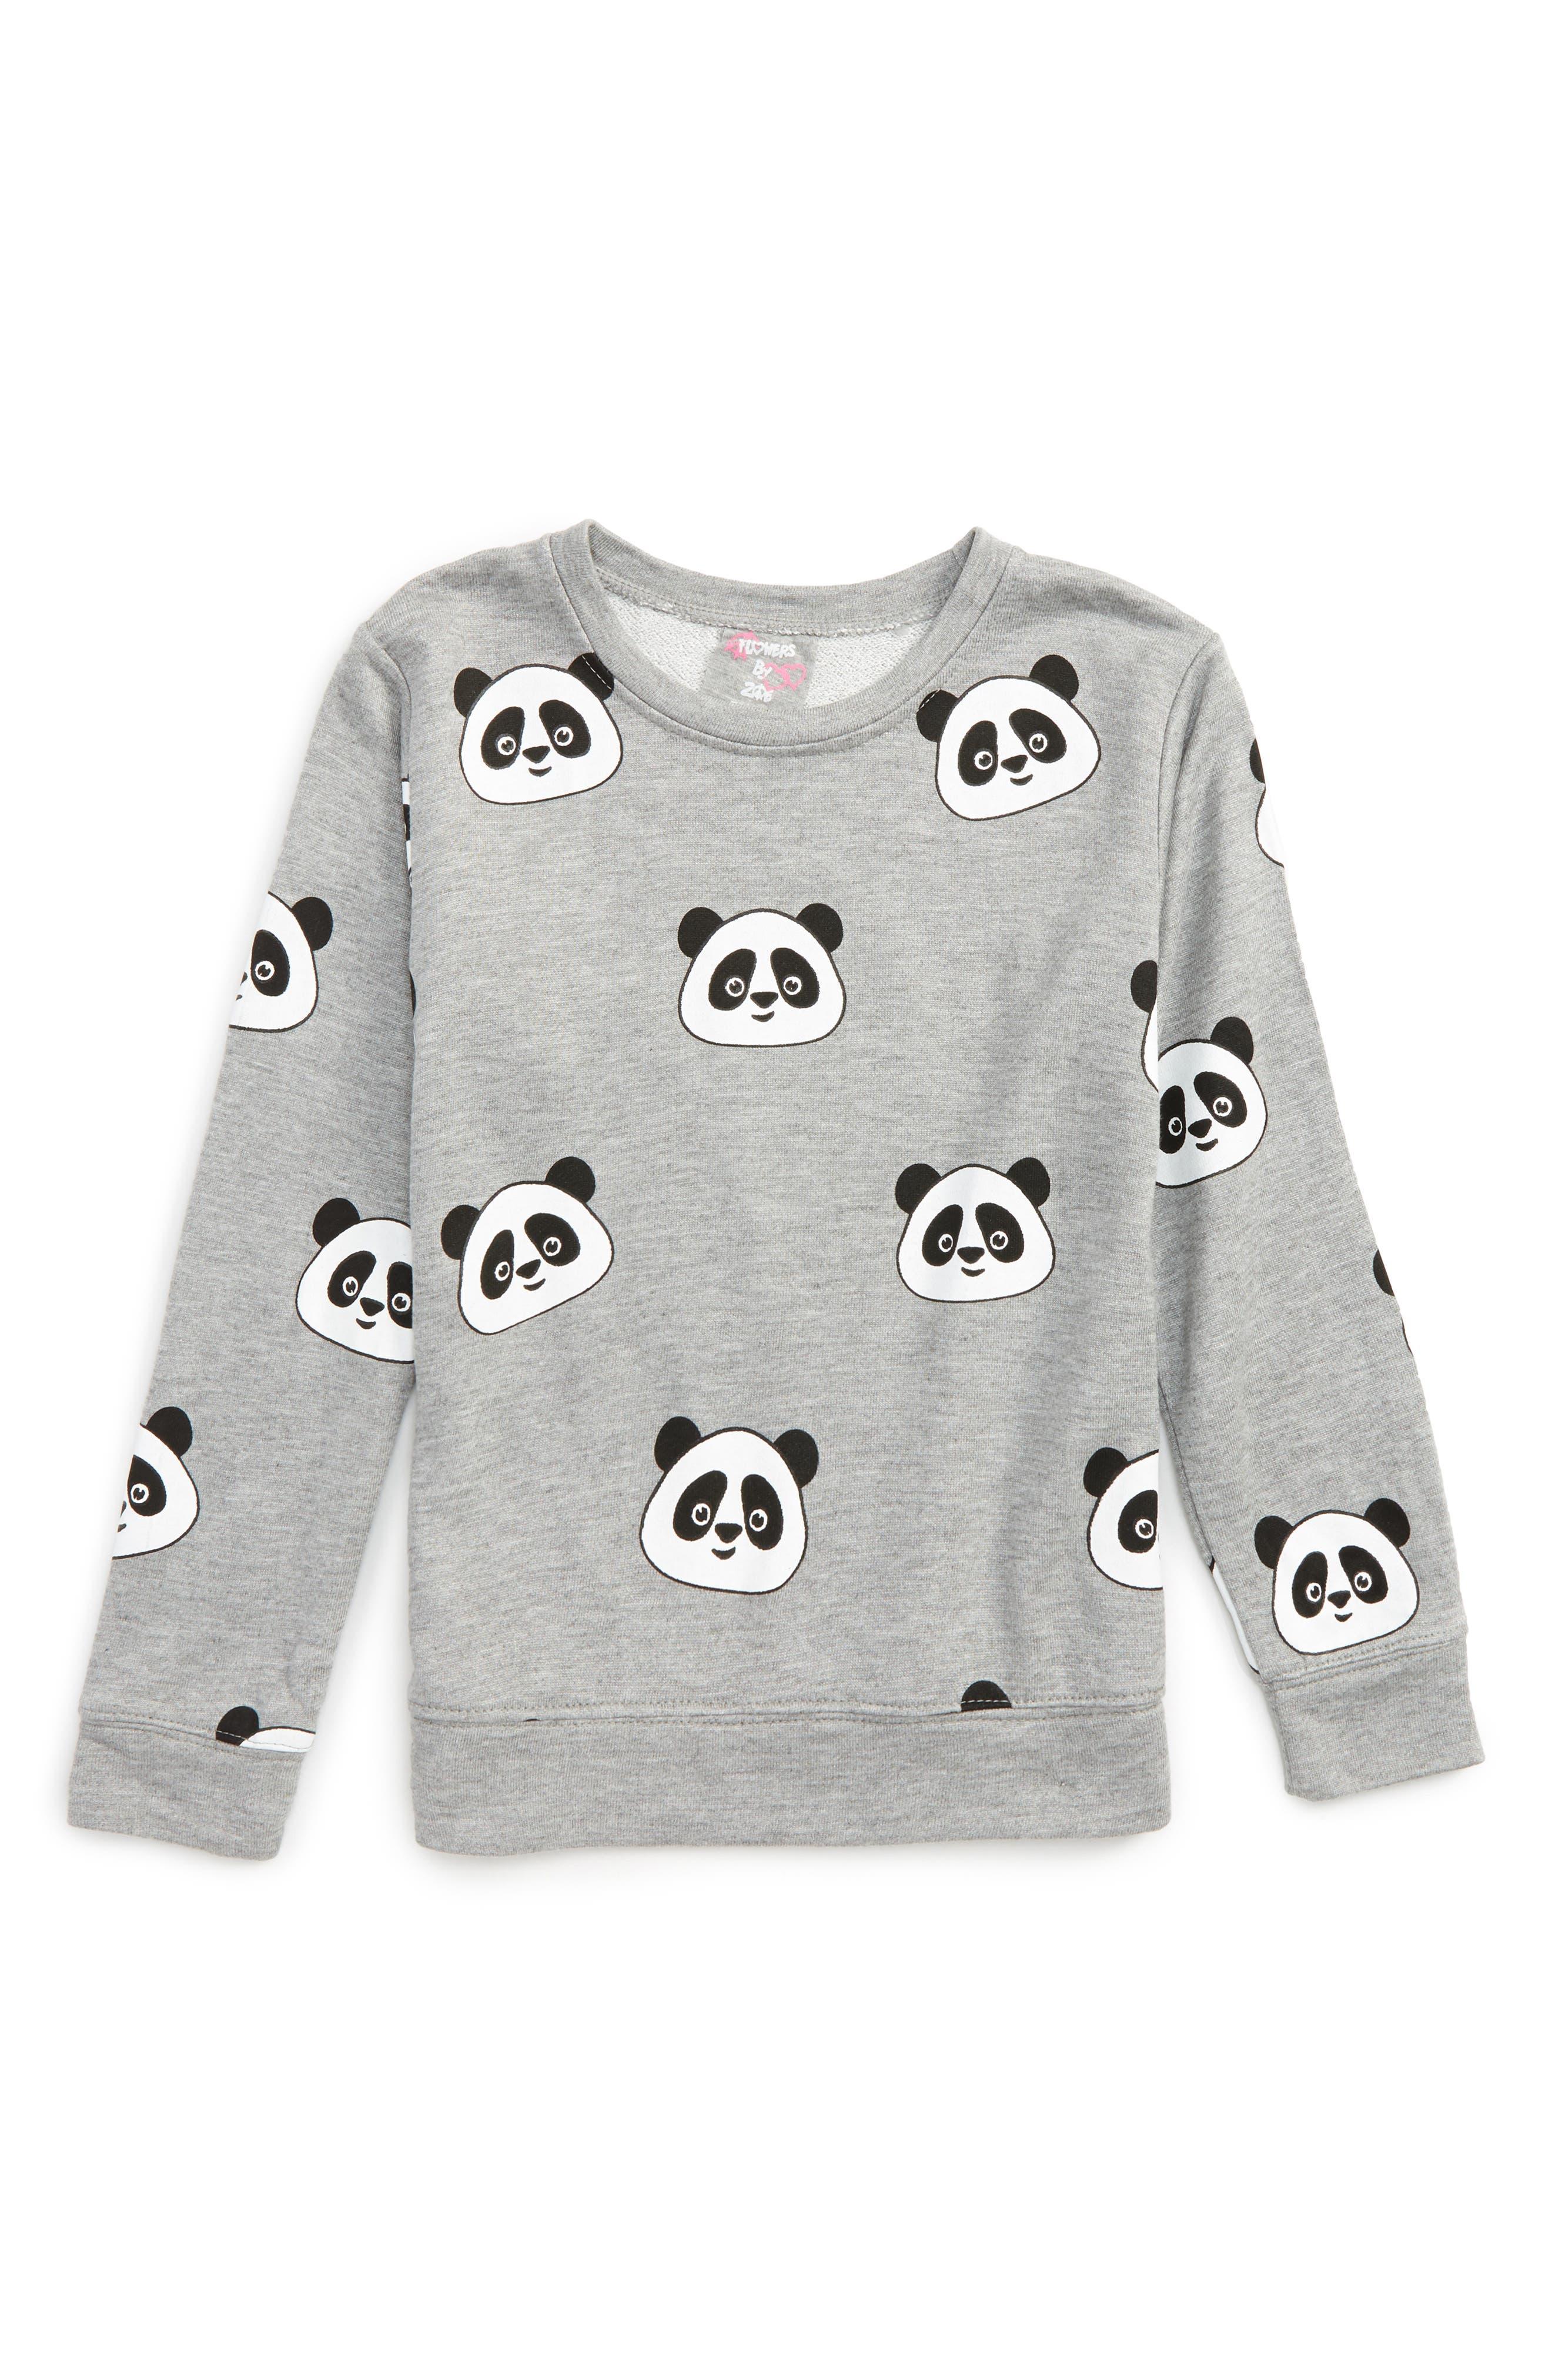 Flowers by Zoe All Over Panda Sweatshirt (Little Girls & Big Girls)